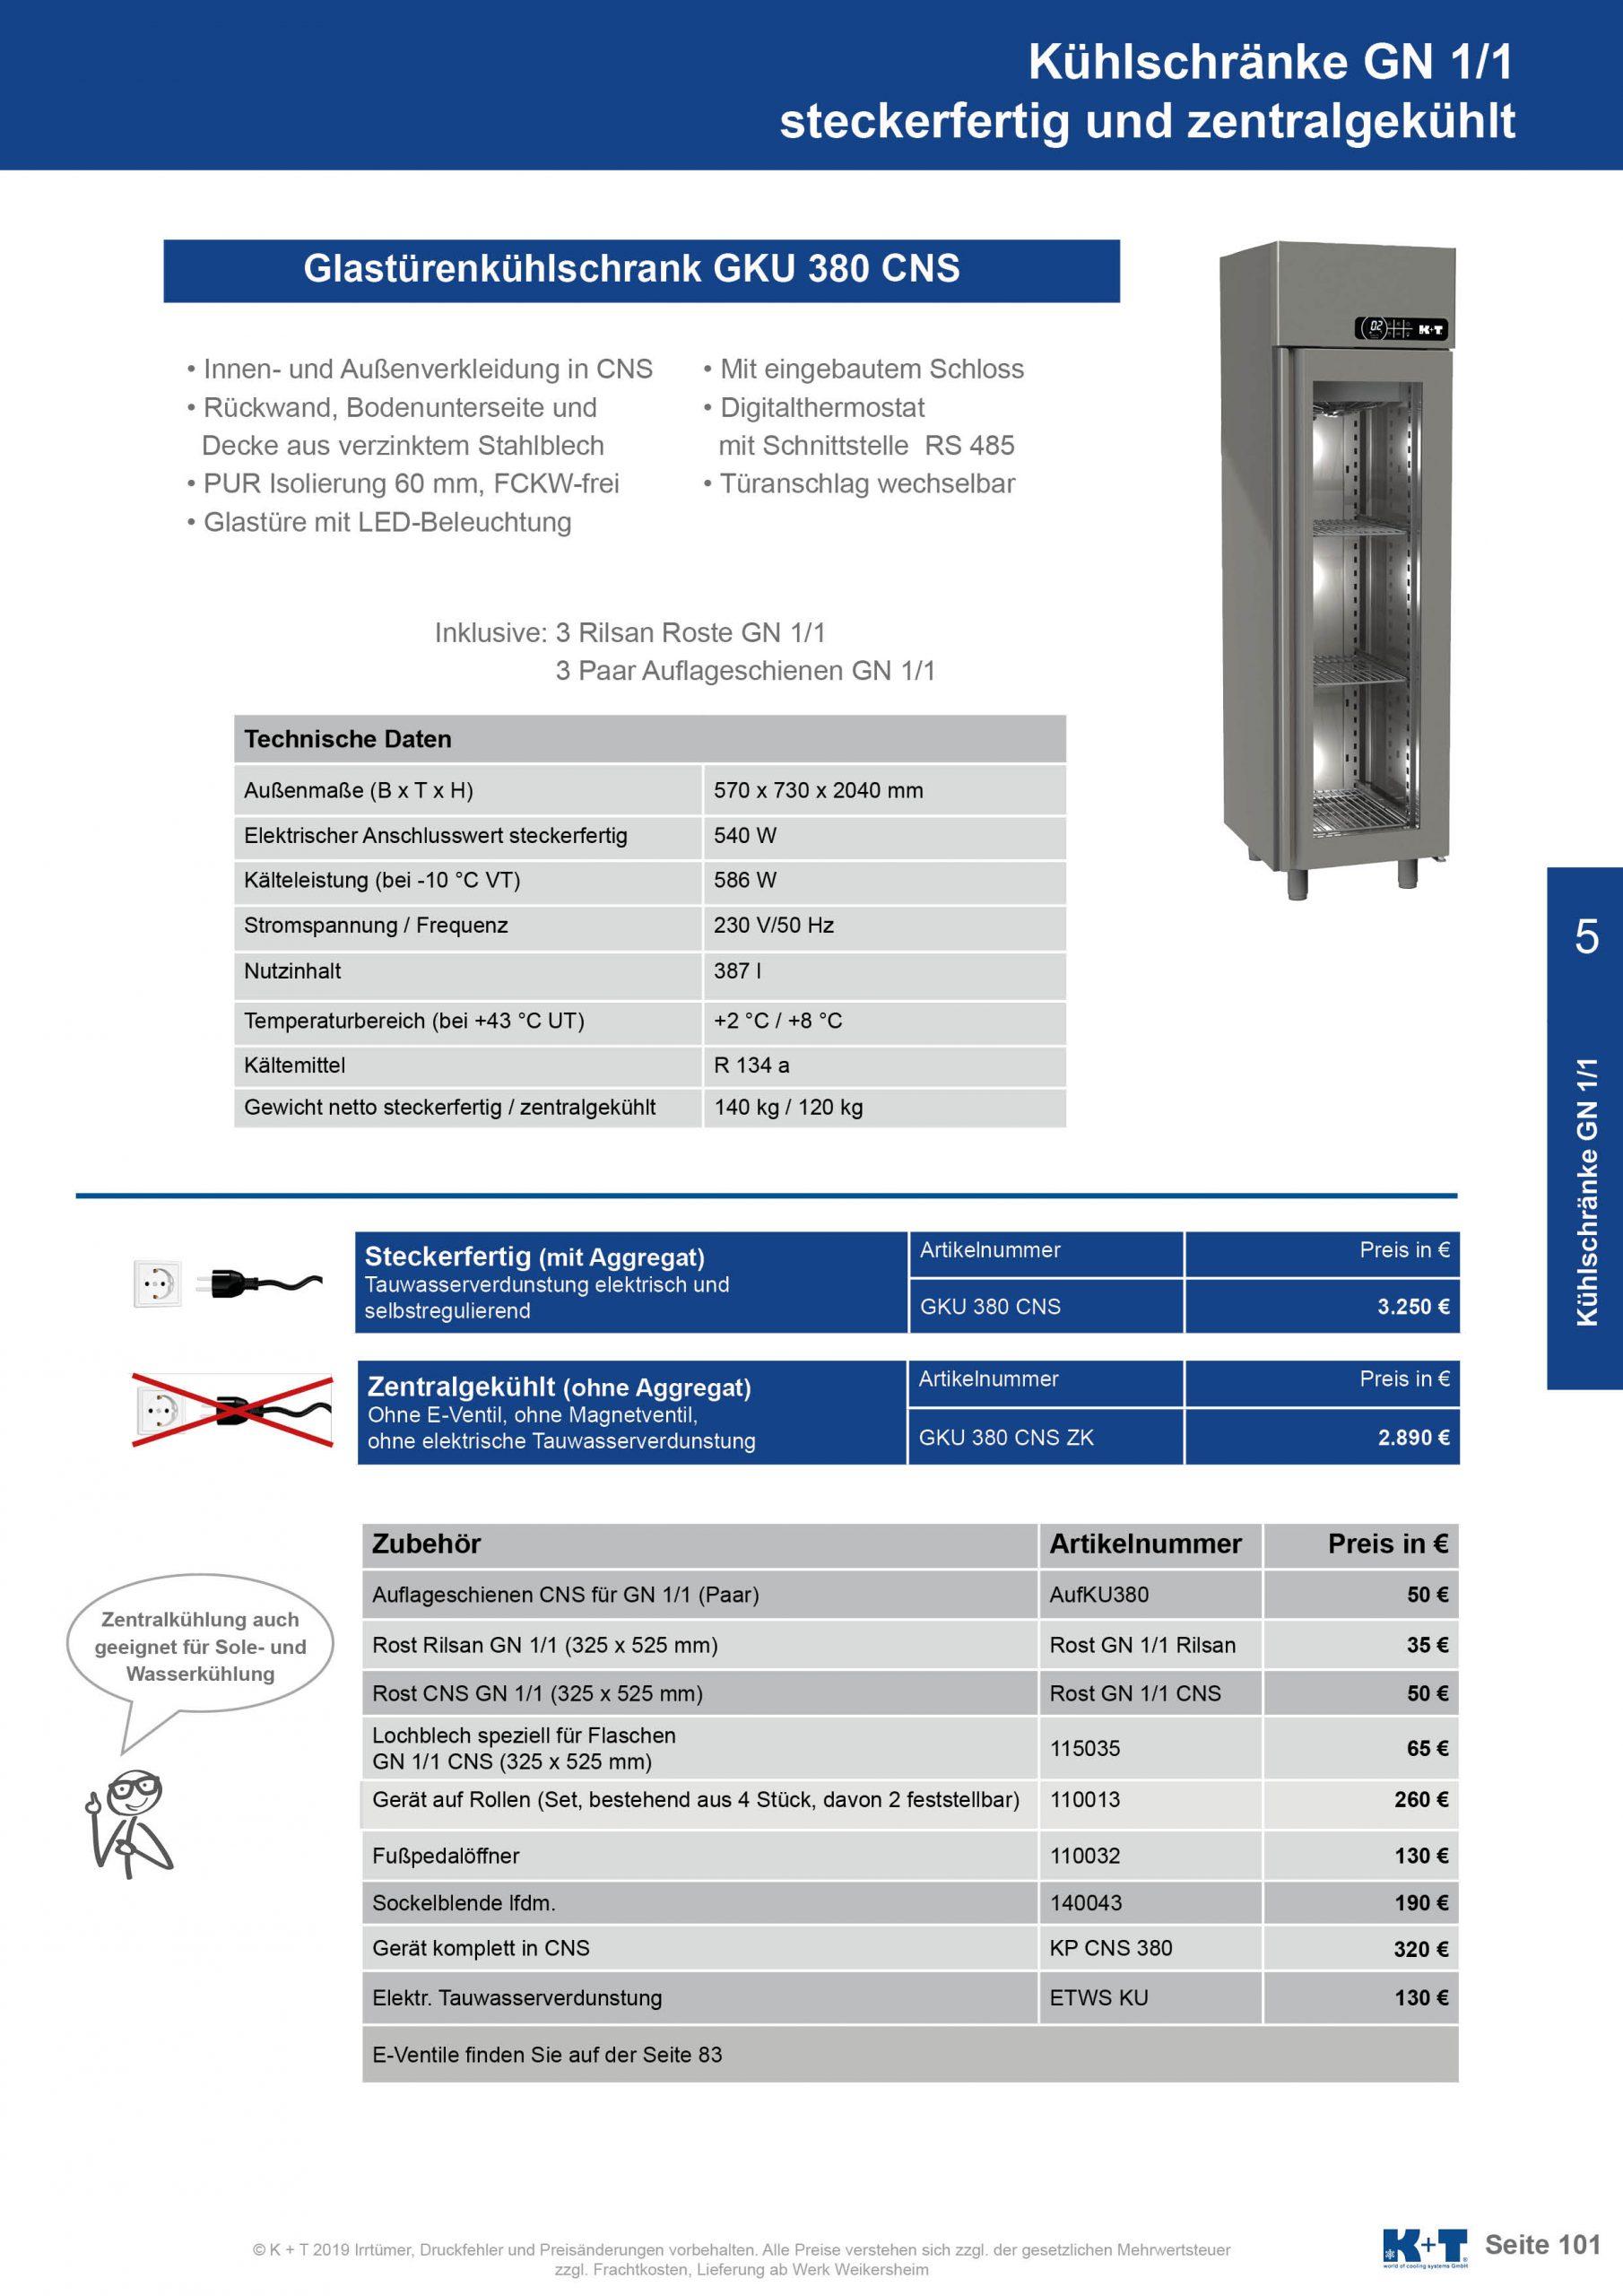 Kühlschränke GN 1_1 Glastürenkühlschrank zentralgekühlt